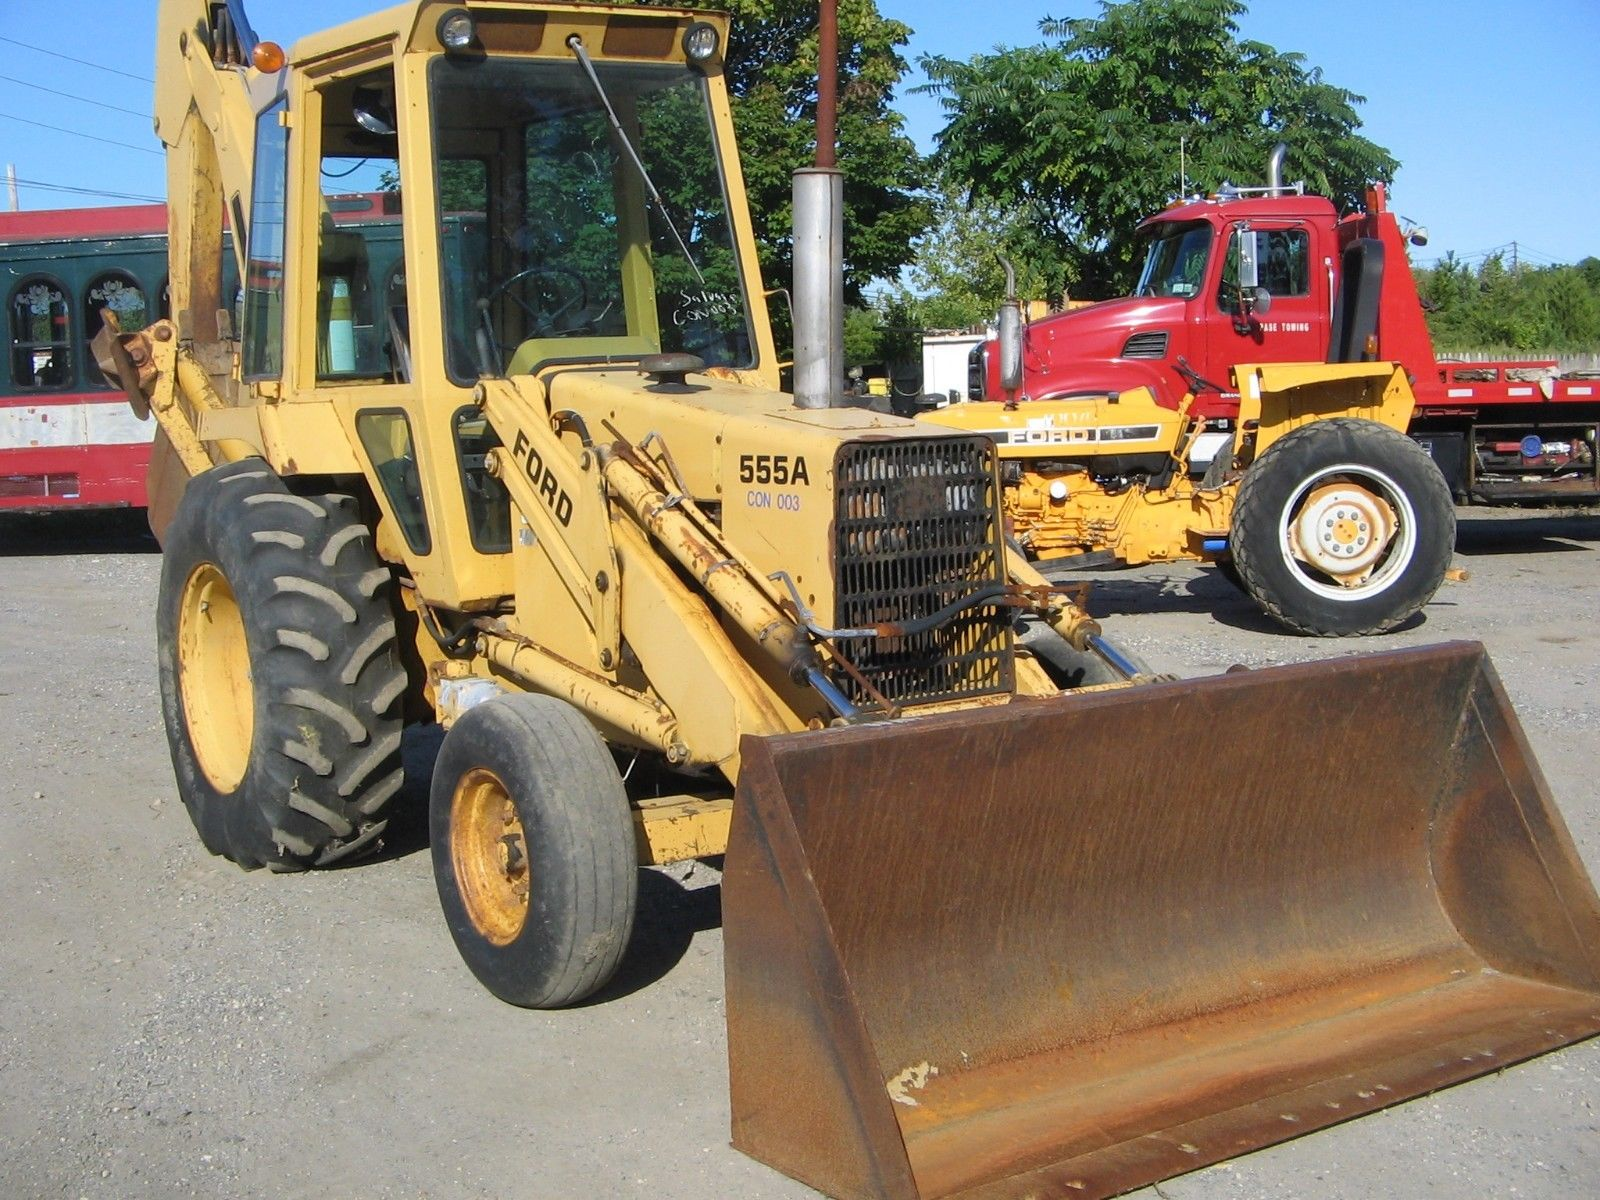 Ford 555a Xl Tractor Loader Backhoe